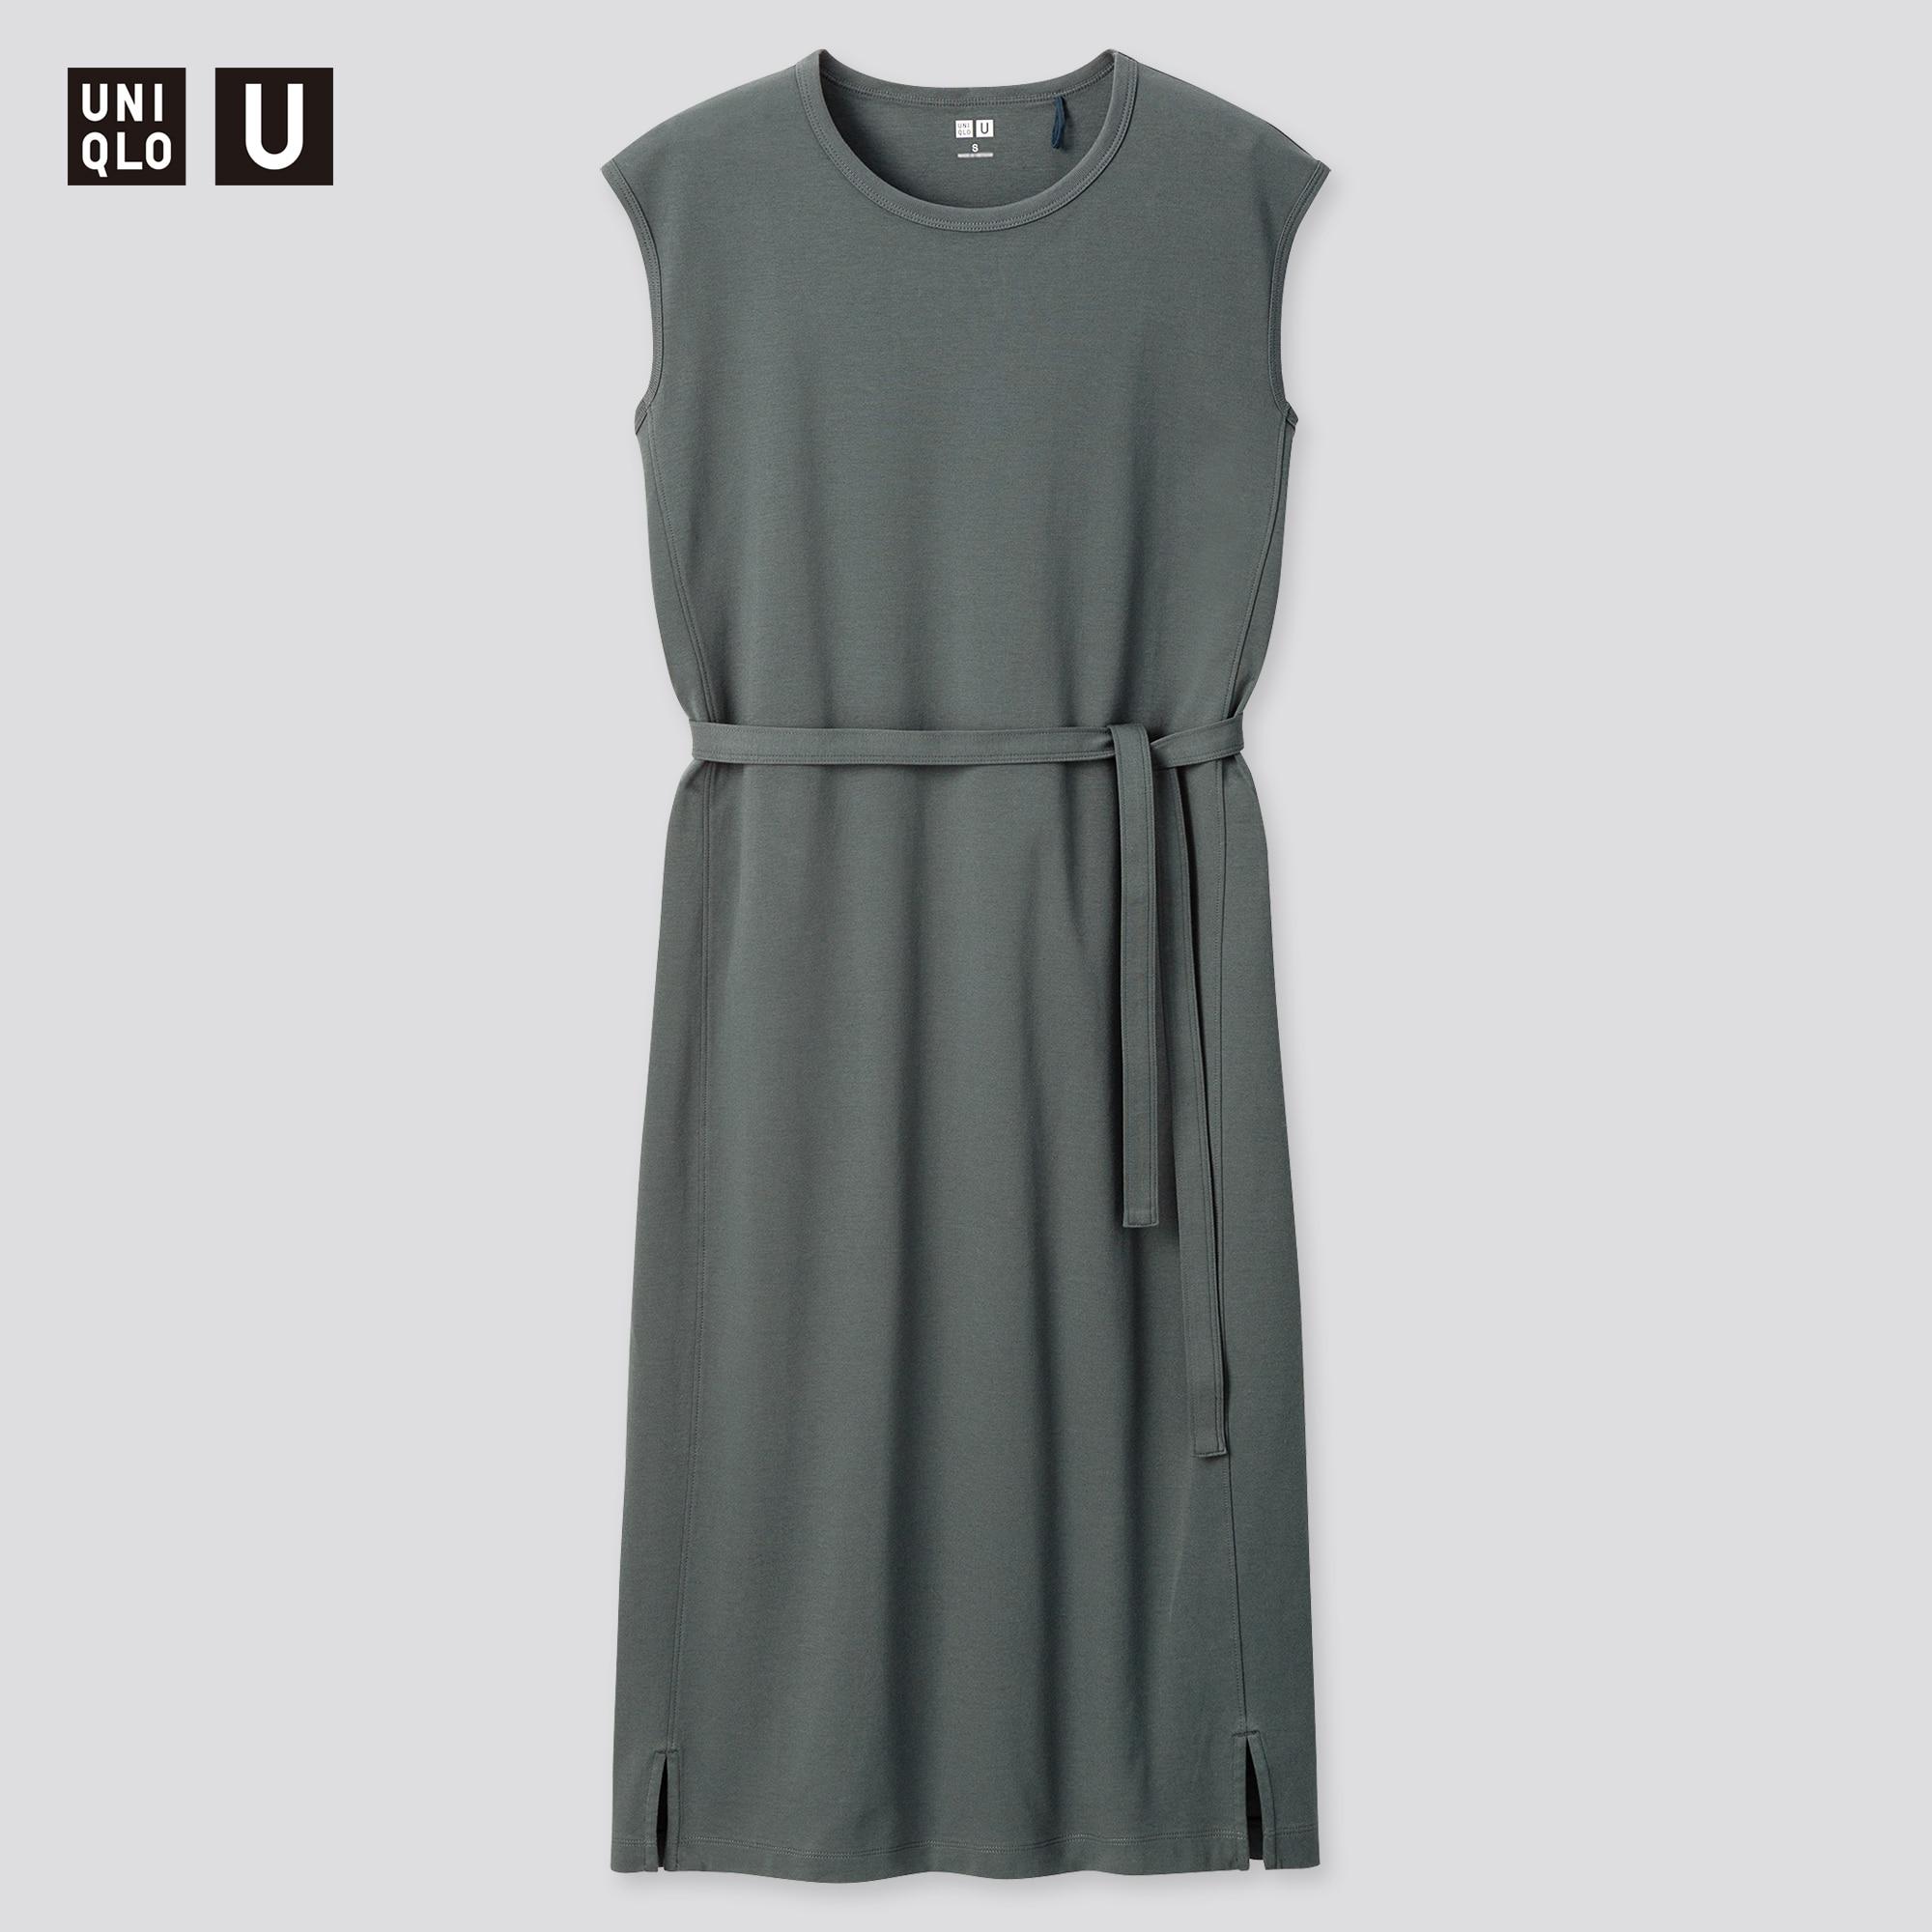 Uniqlo women u crew neck sleeveless dress